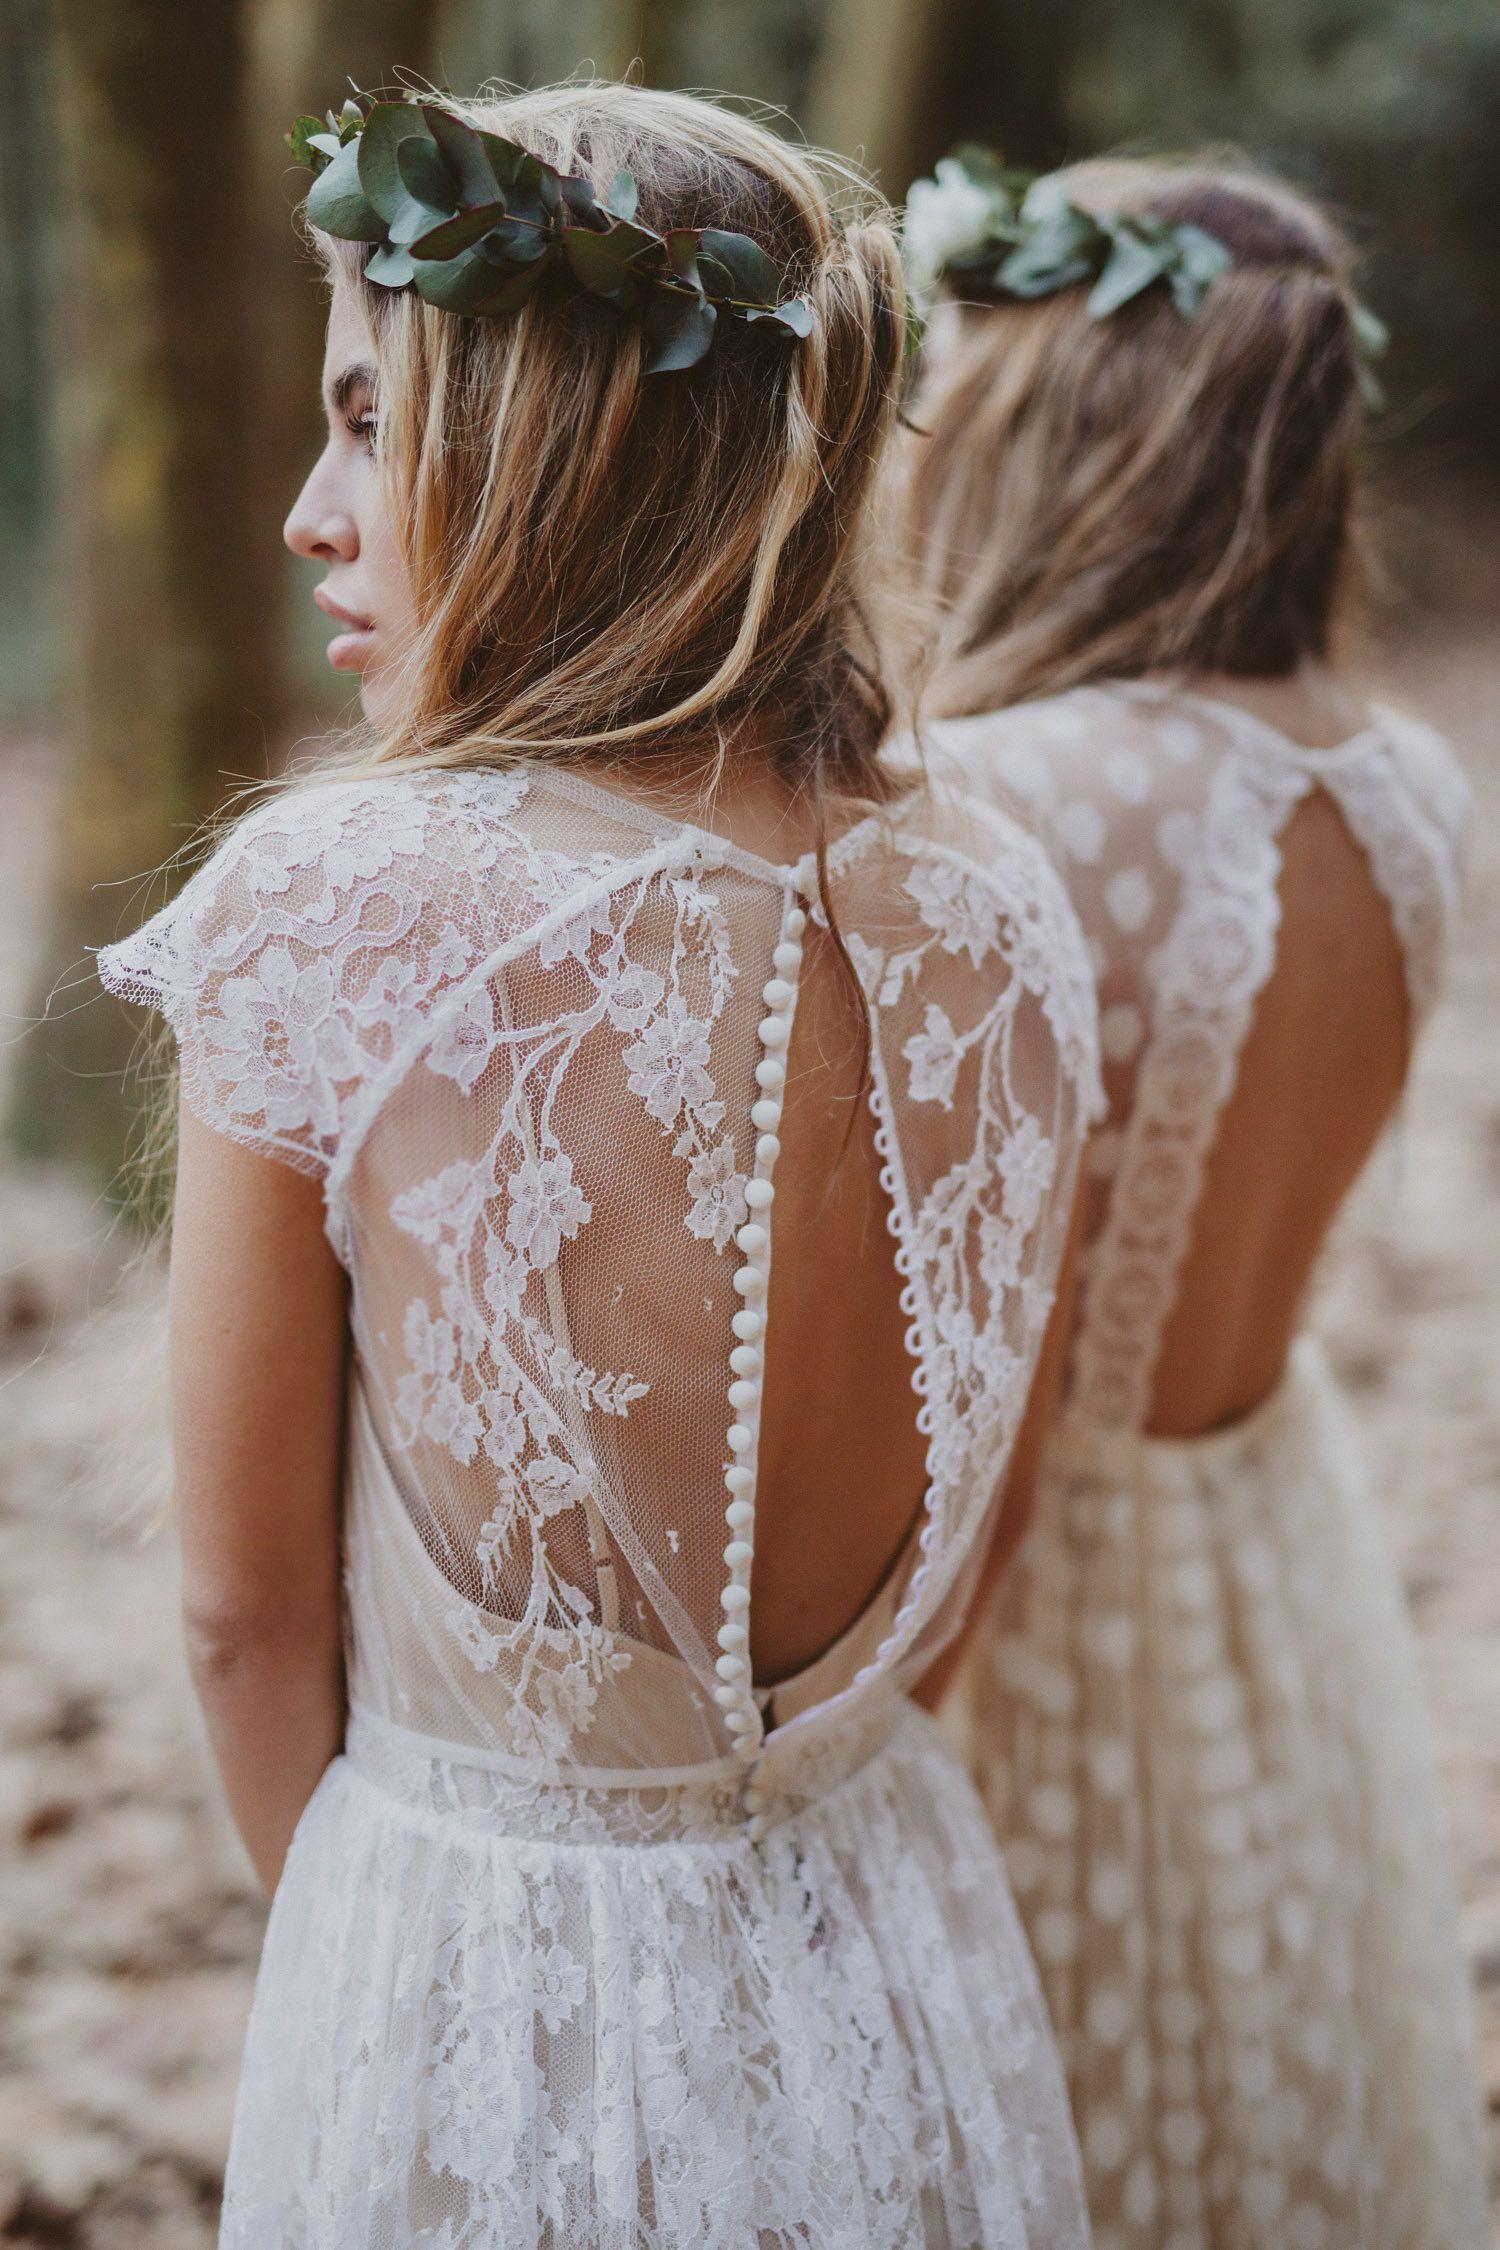 Boho wedding dress with sleeves  Pin by Sylvia Edionseri on Bride el  Pinterest  Wedding Wedding